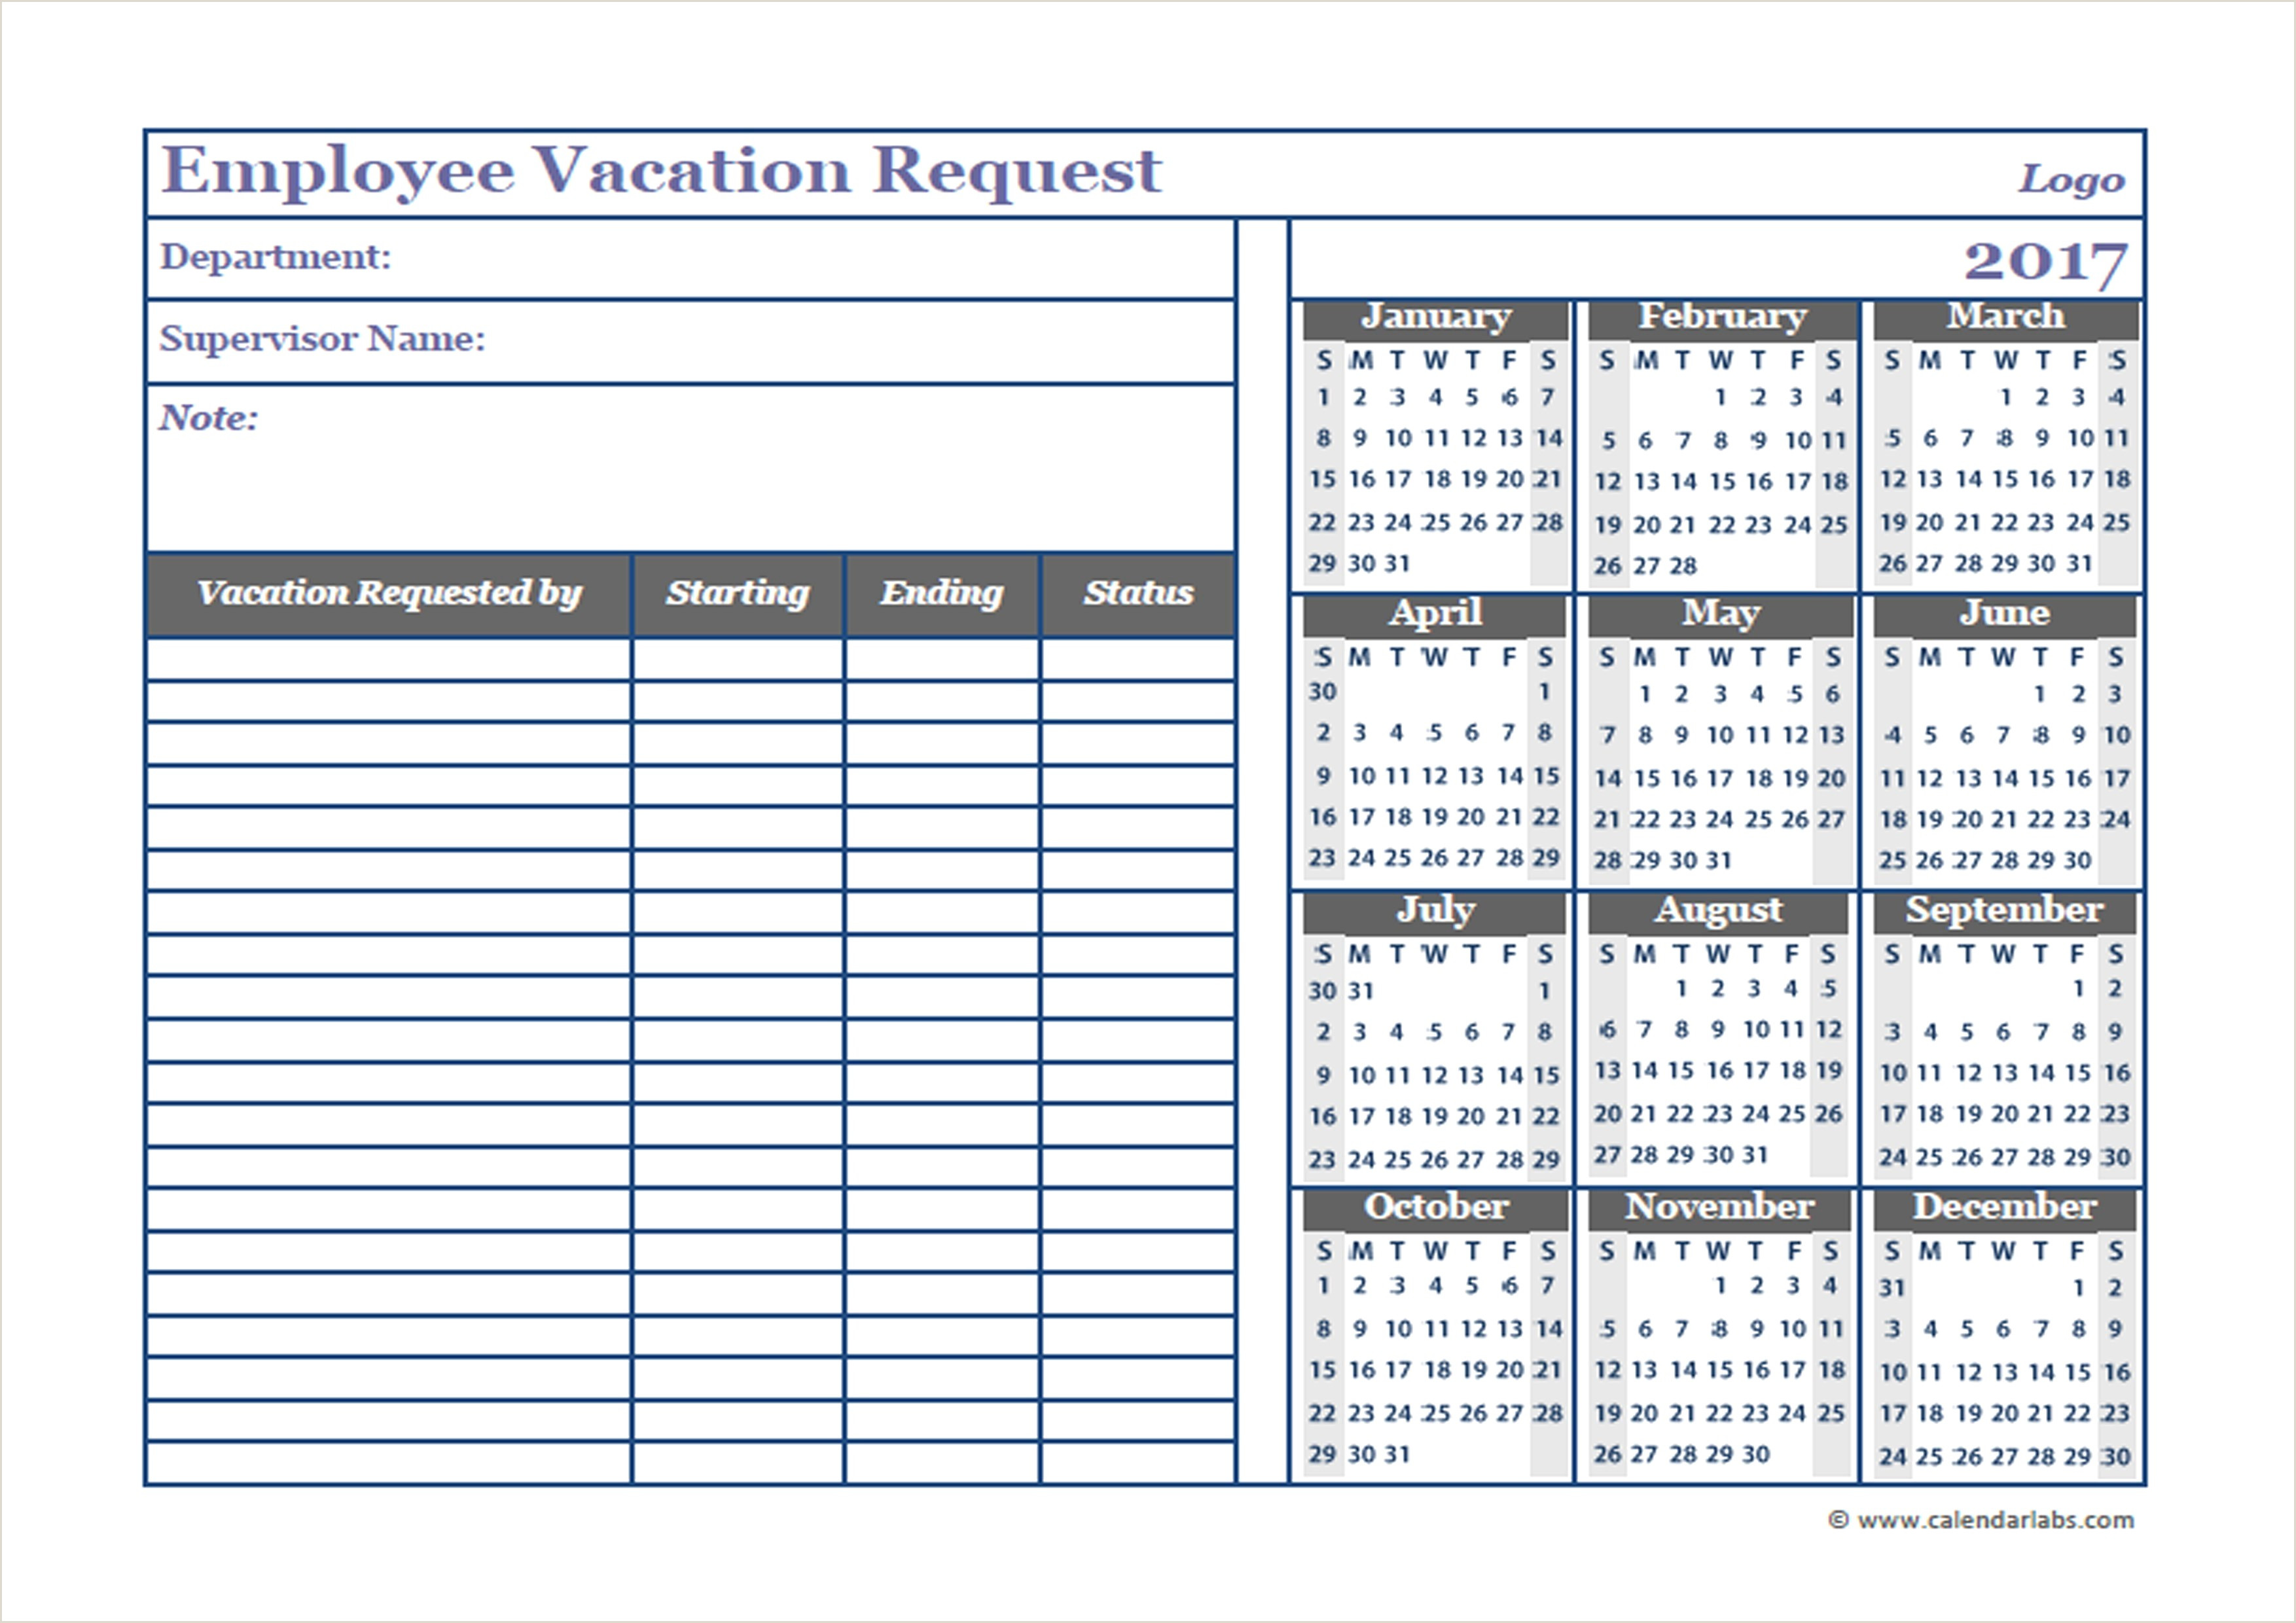 Fmla Rolling Calendar Tracking Spreadsheet Employee Vacation Calendar Template 2017 Printable for Free